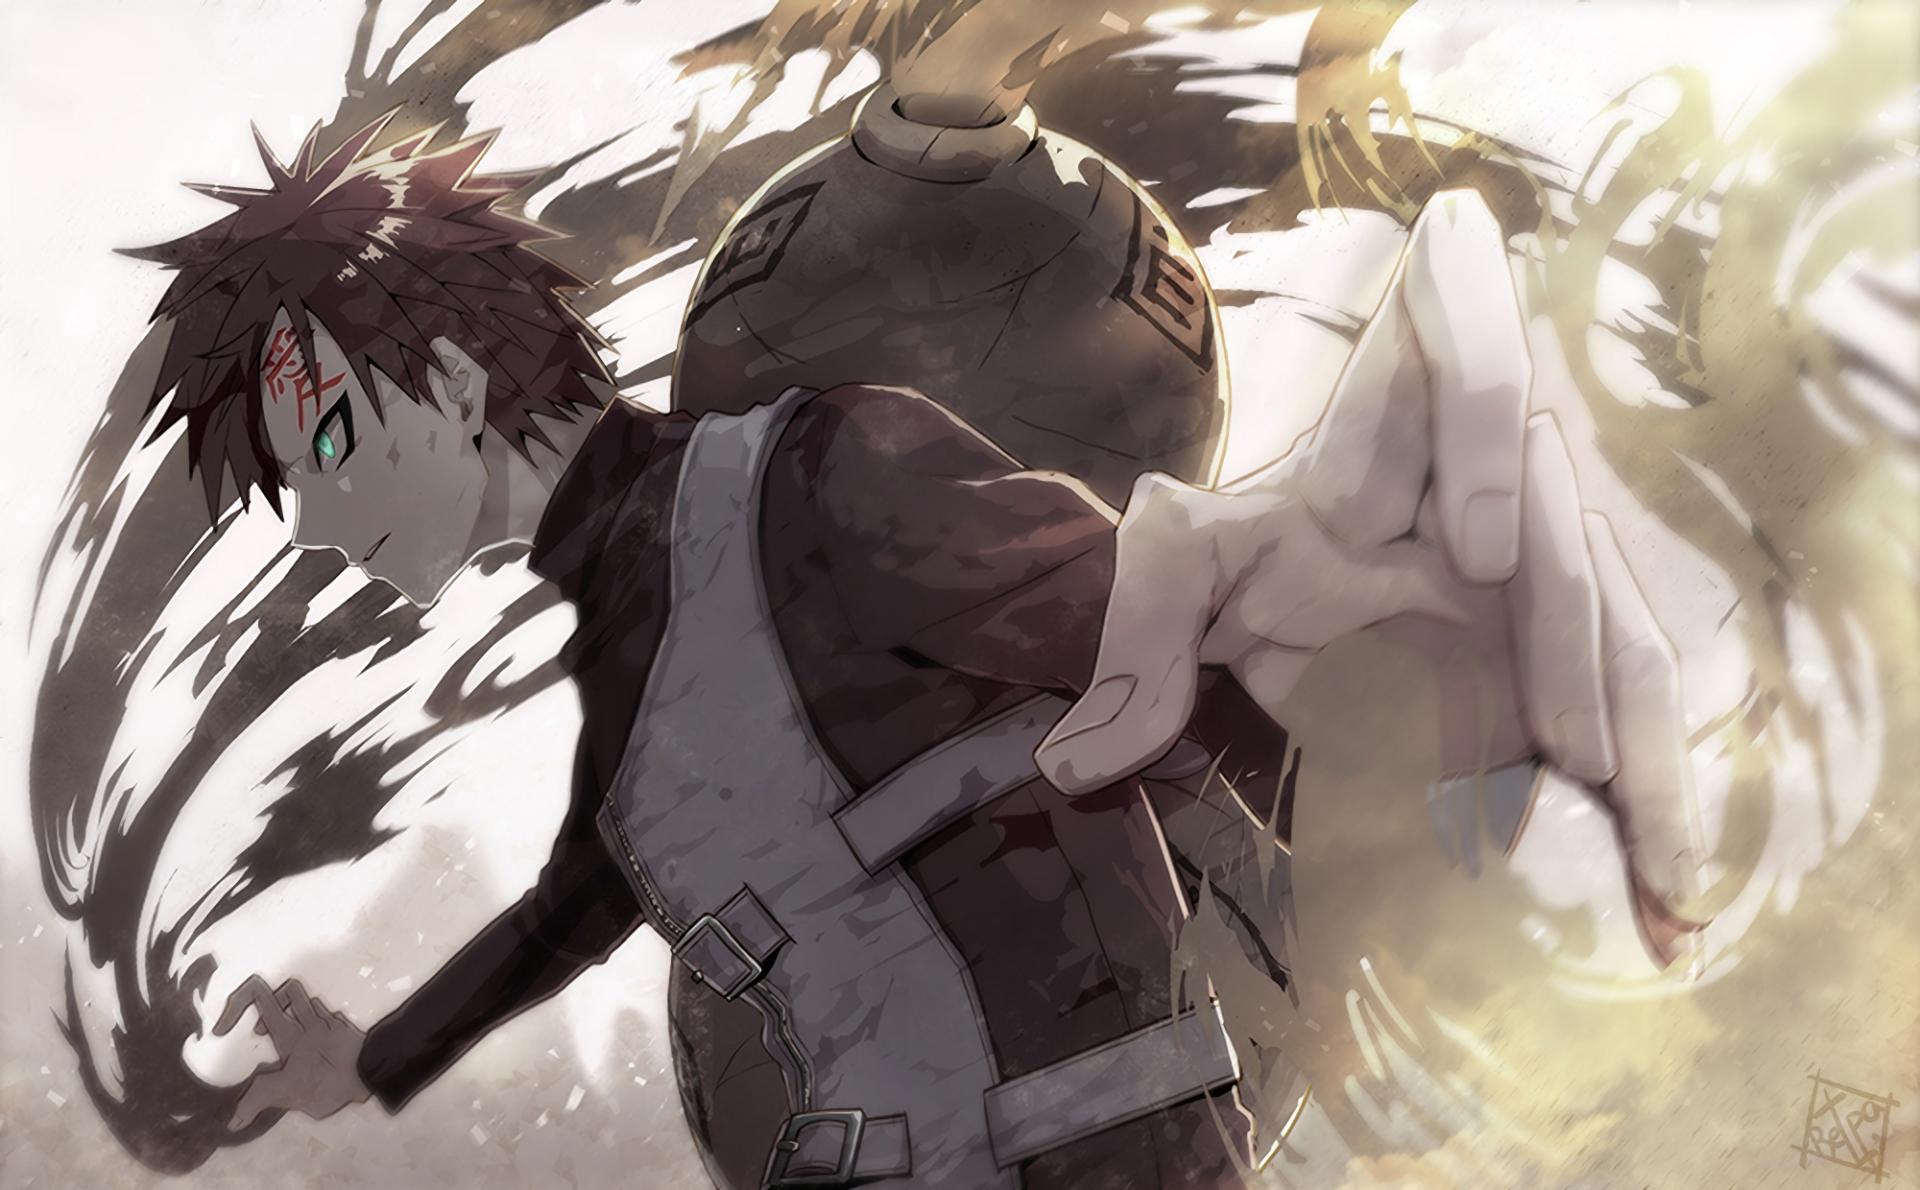 https://get.wallhere.com/photo/anime-Naruto-Shippuuden-Gaara-mythology-screenshot-39705.png